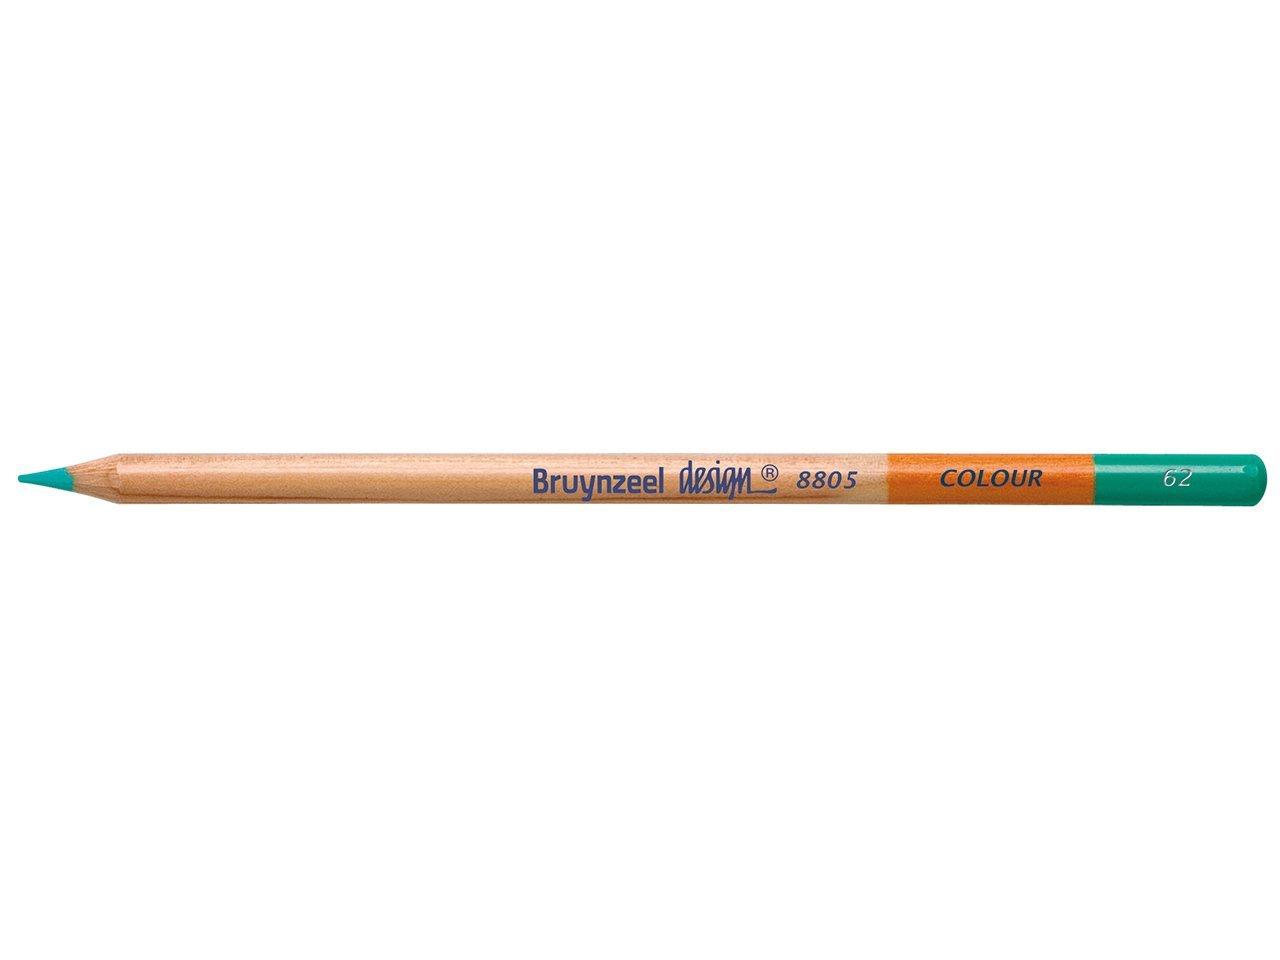 Bruynzeel Pencil - 62 Leafgreen